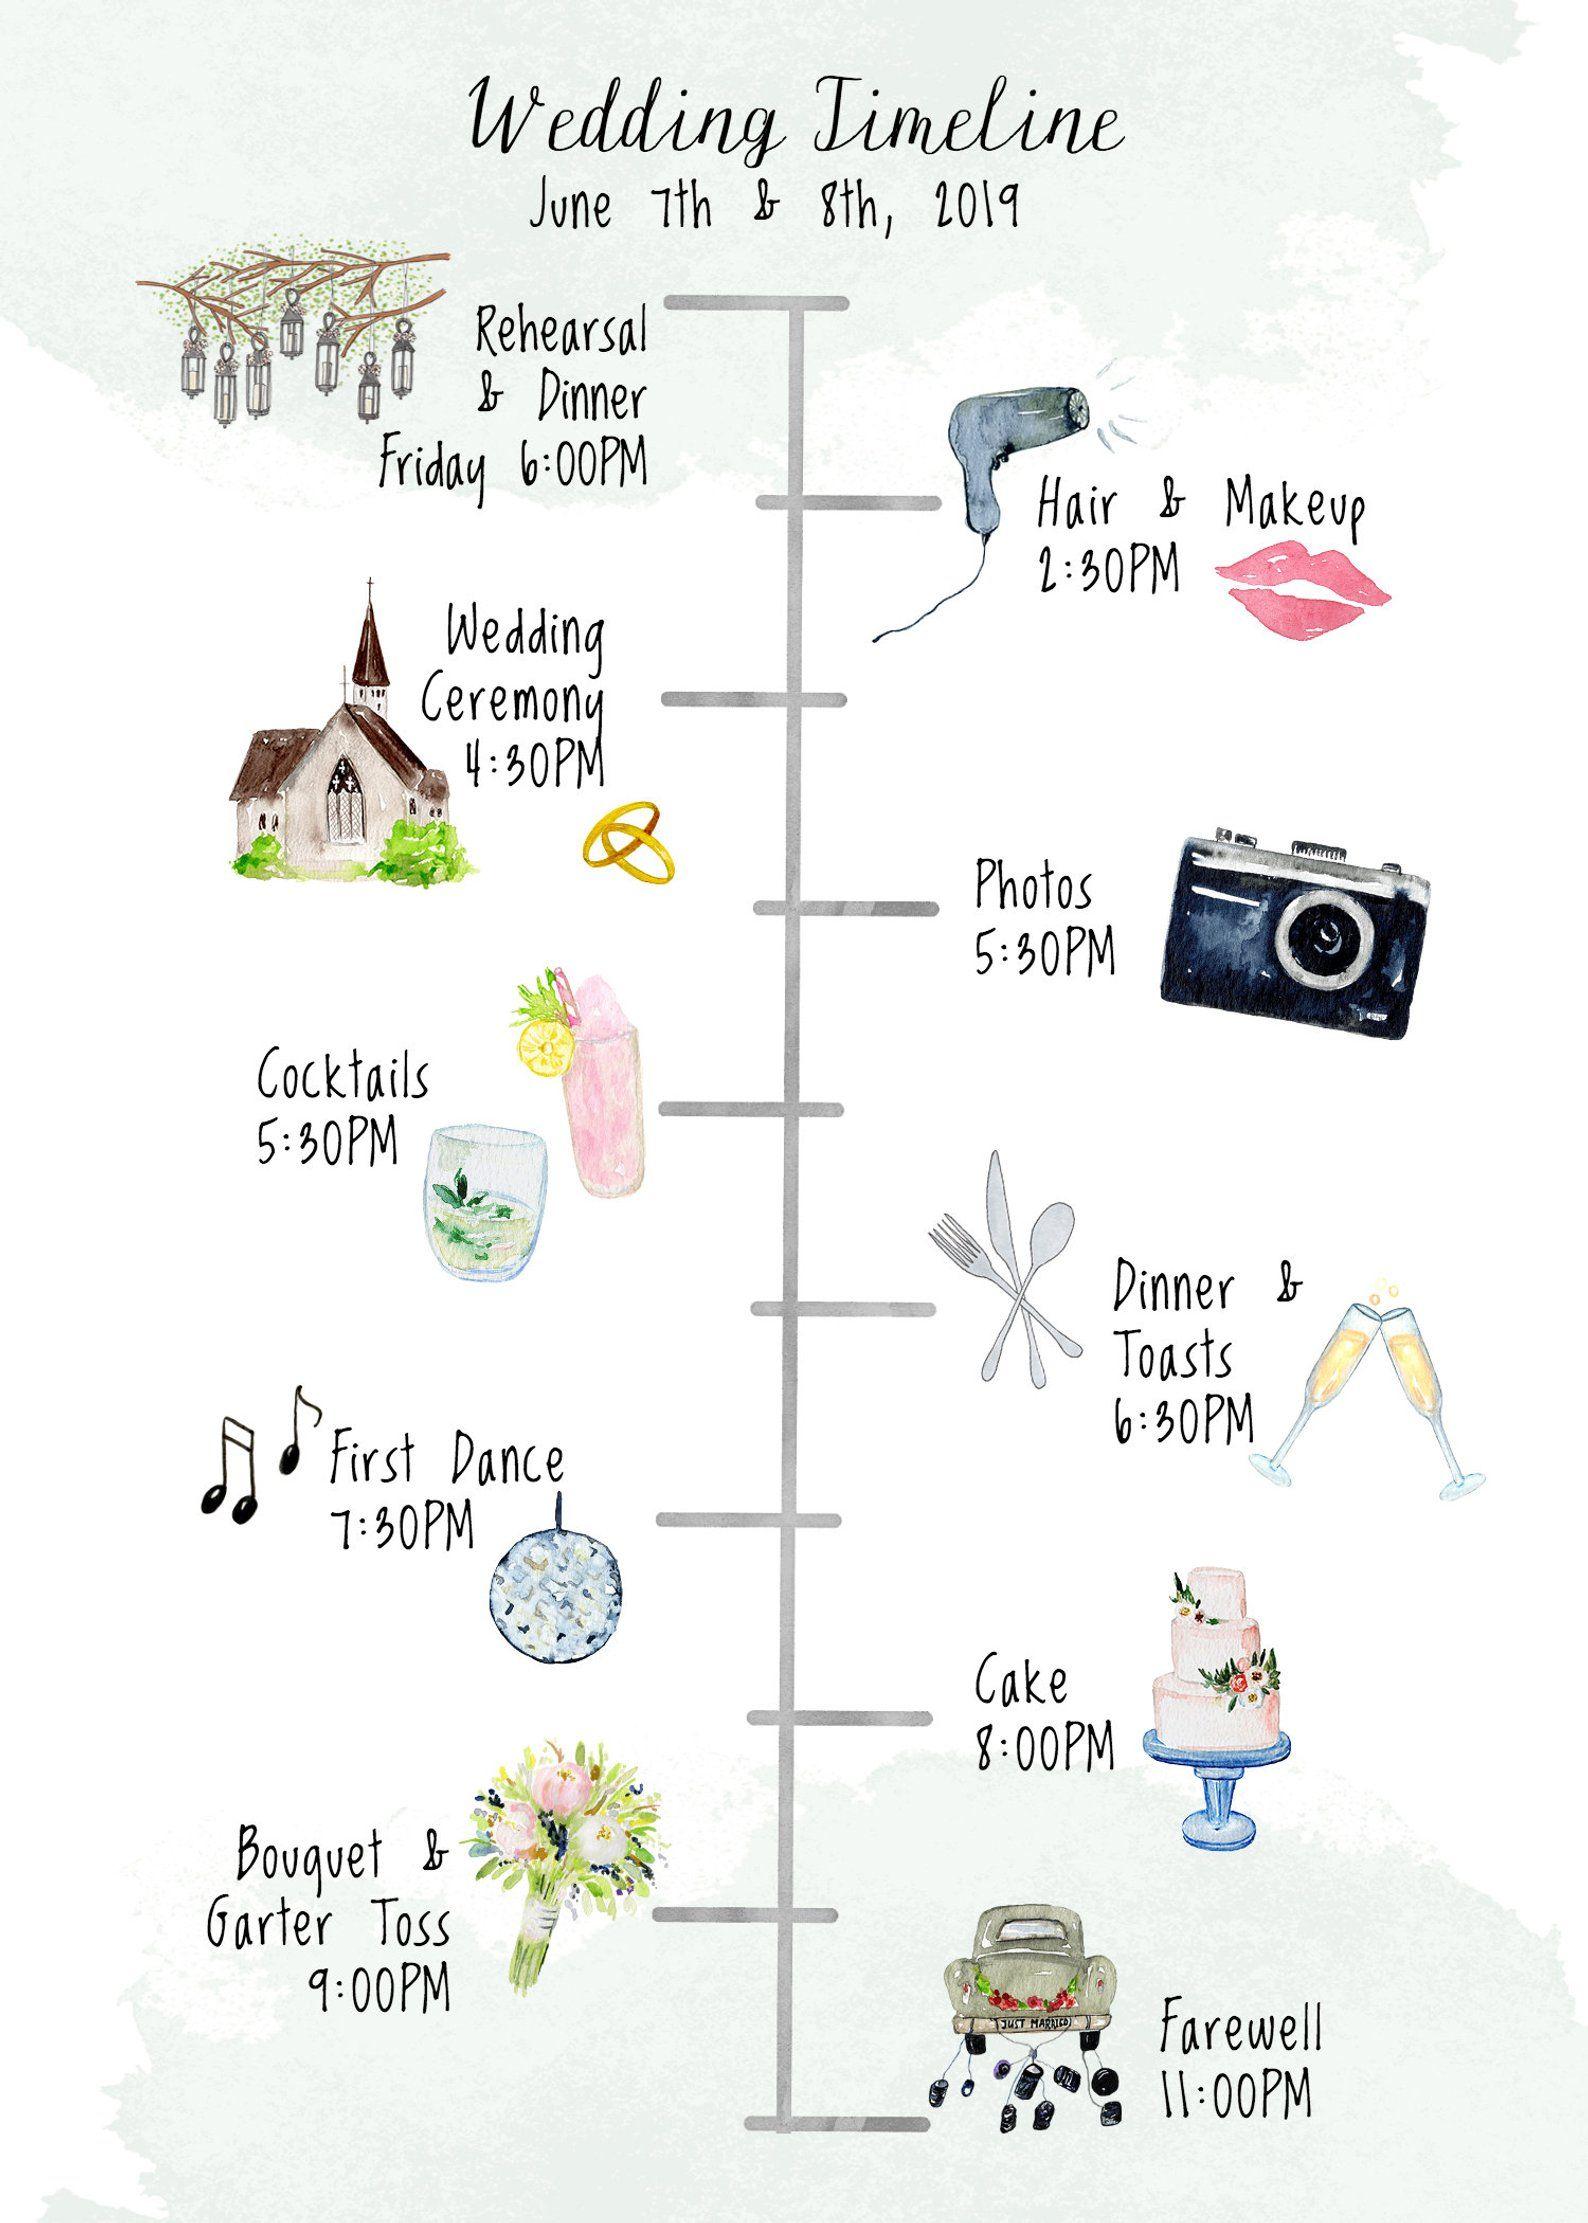 Wedding Timeline Editable Timeline Printable Wedding Etsy Wedding Itinerary Template Wedding Itinerary Wedding Timeline Wedding timeline day of template